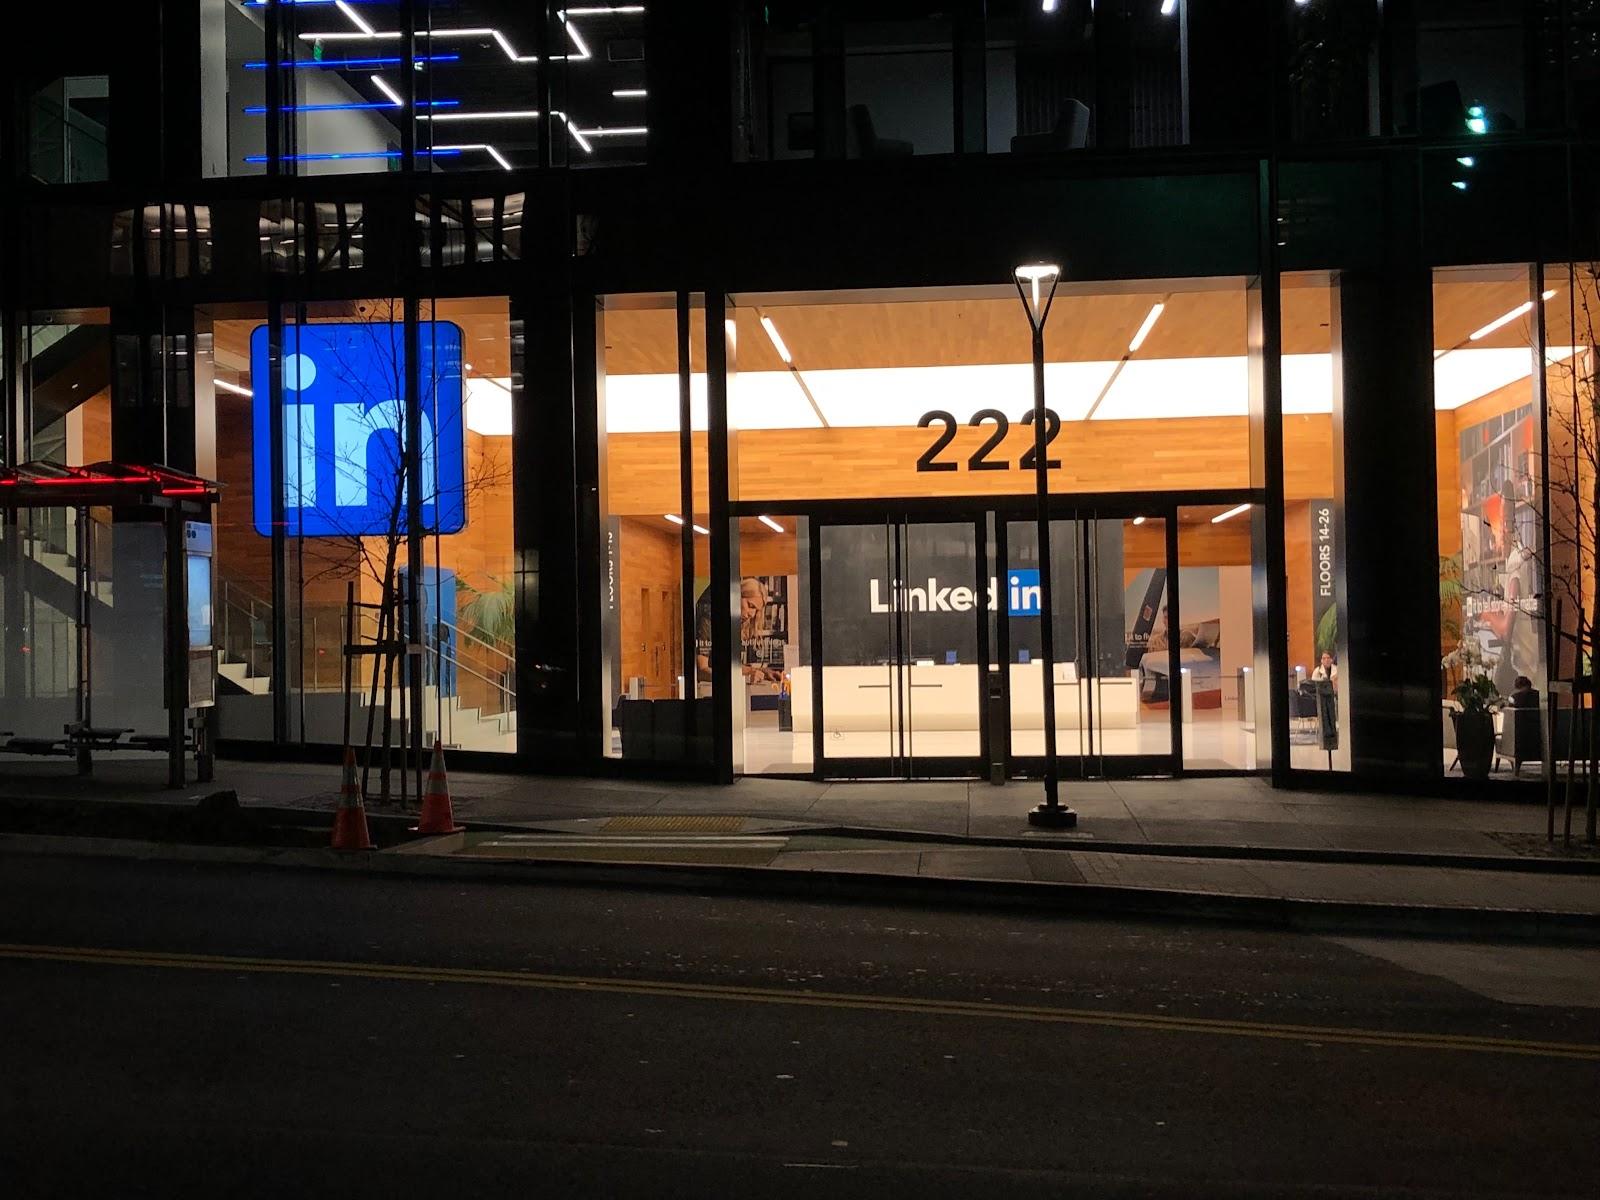 LinkedIn headquarters, where the magic of marketing happens